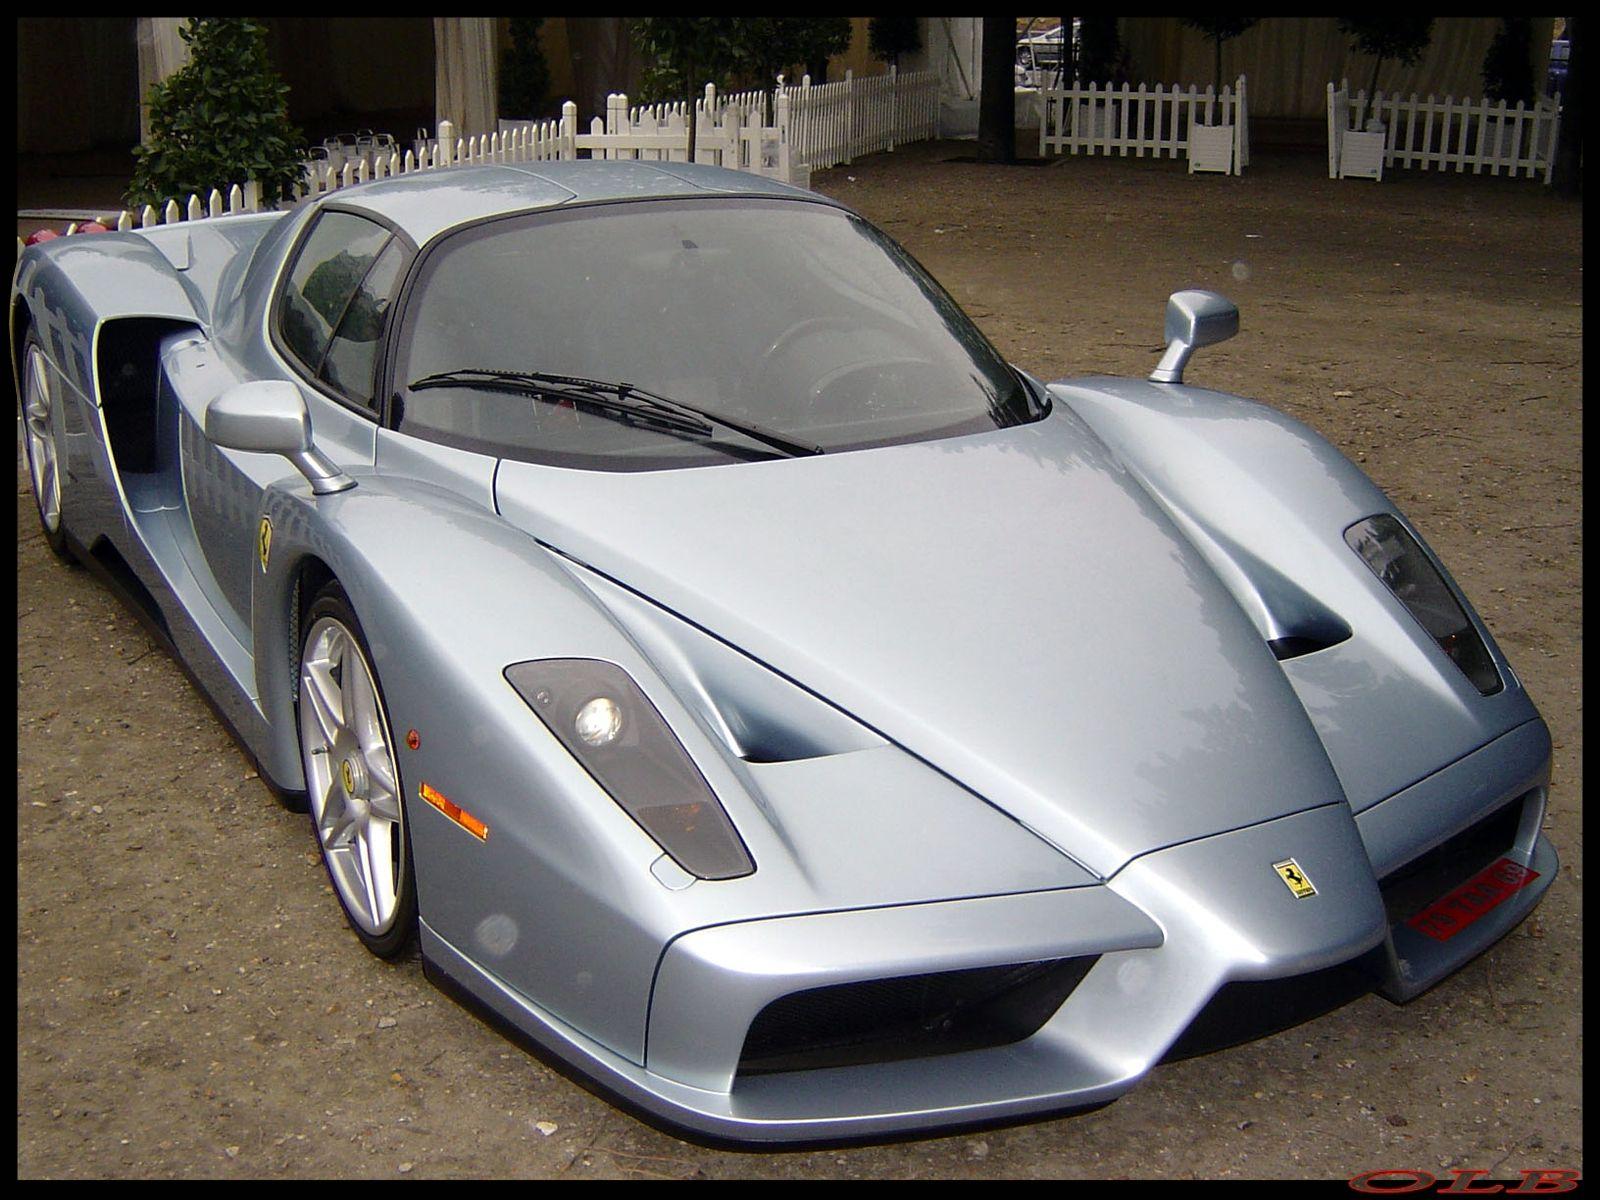 Ferrari Enzo Silver With Images Ferrari Enzo Ferrari Car